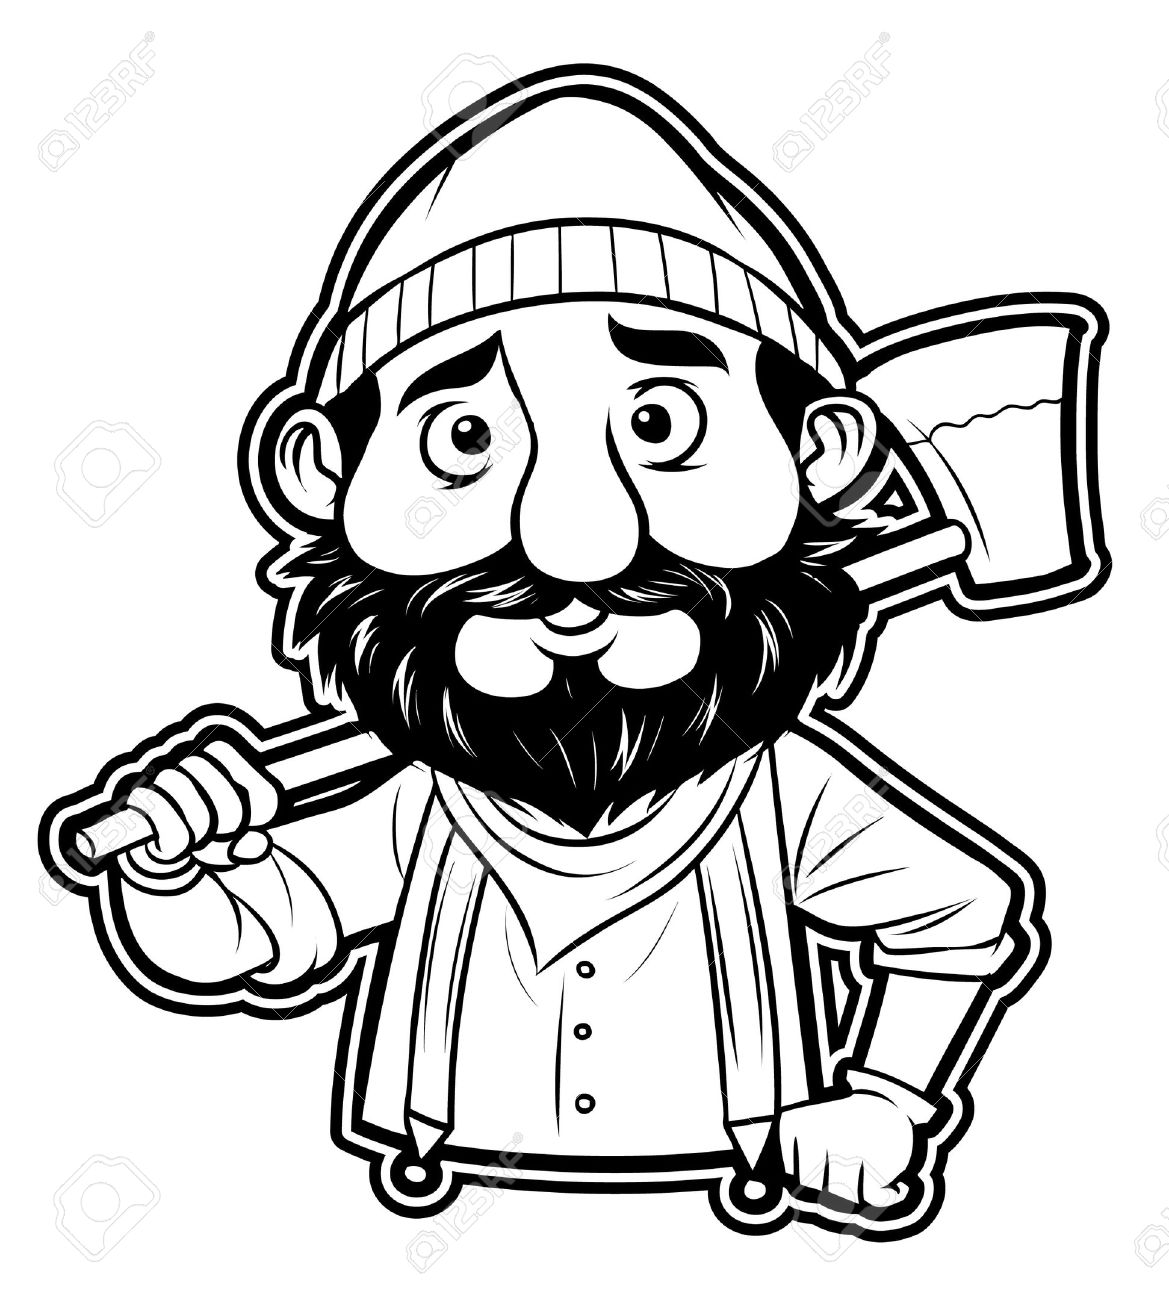 black and white clipart lumberjack.